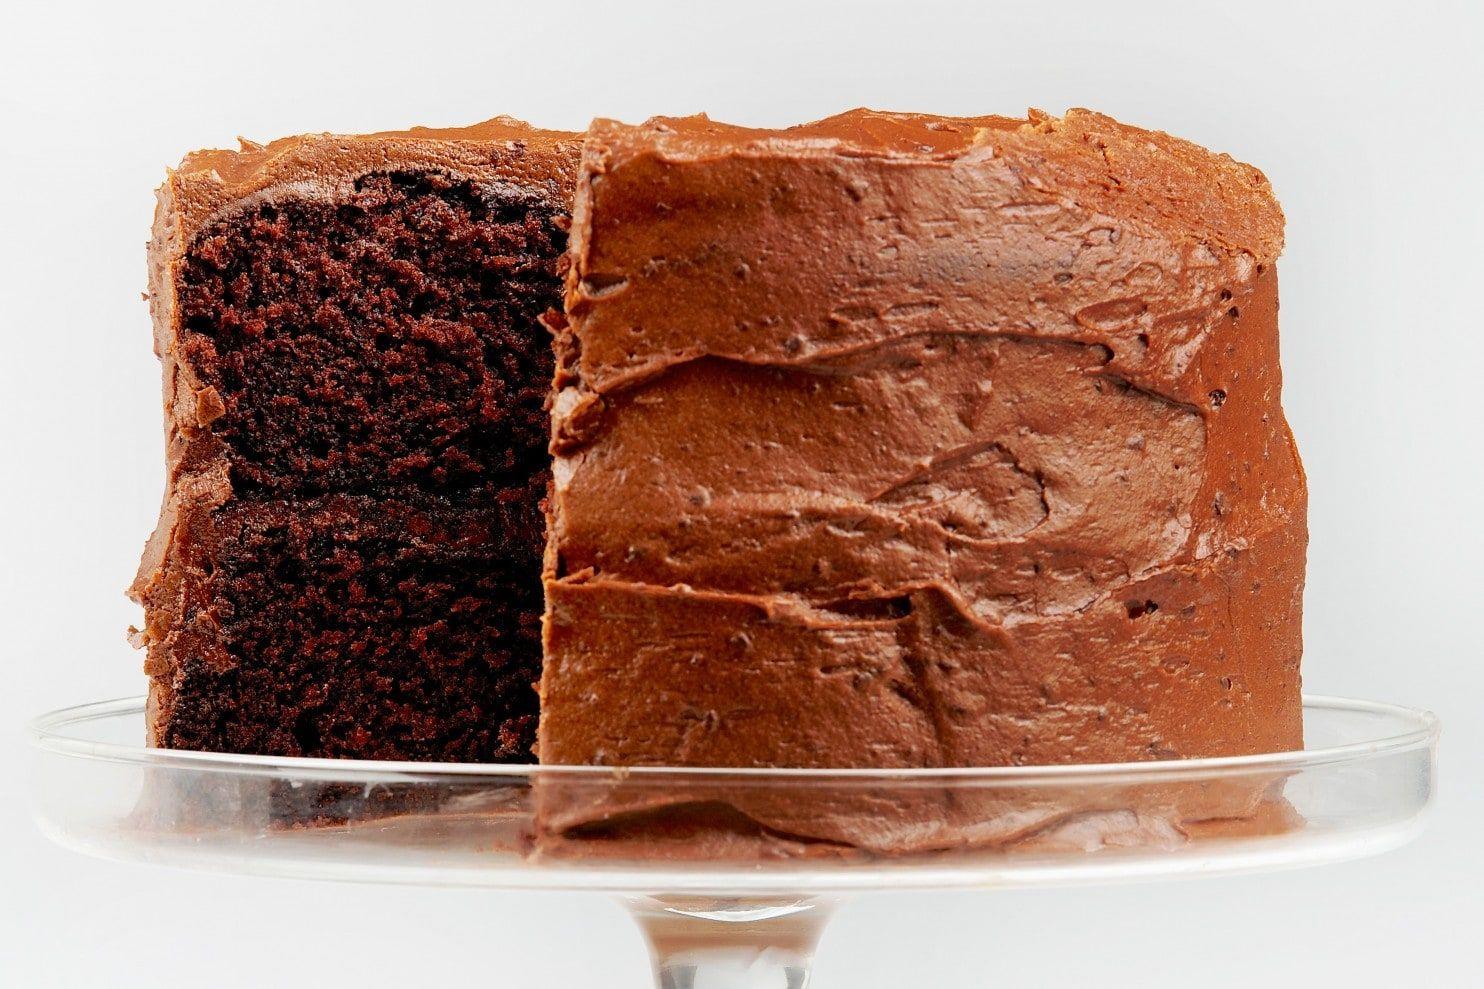 Dukes chocolate cake recipe national chocolate cake